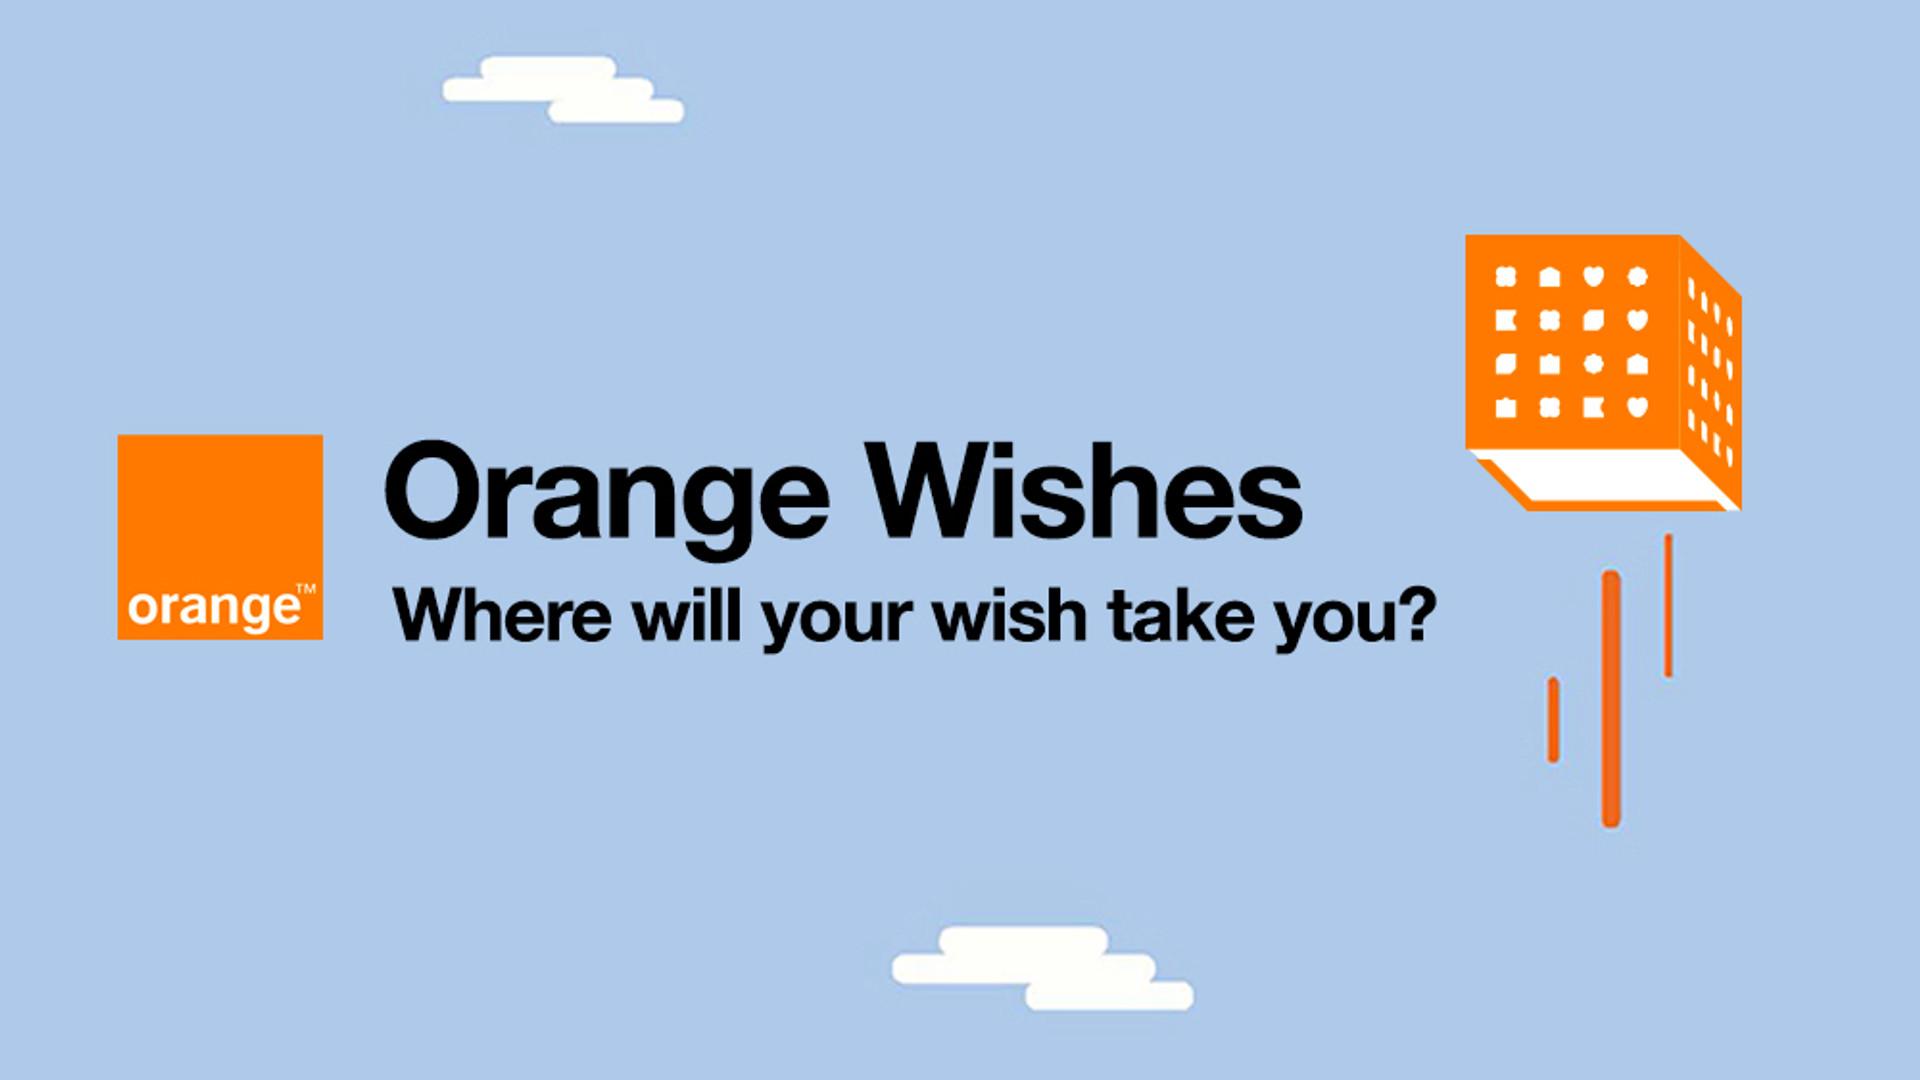 Orange Wishes